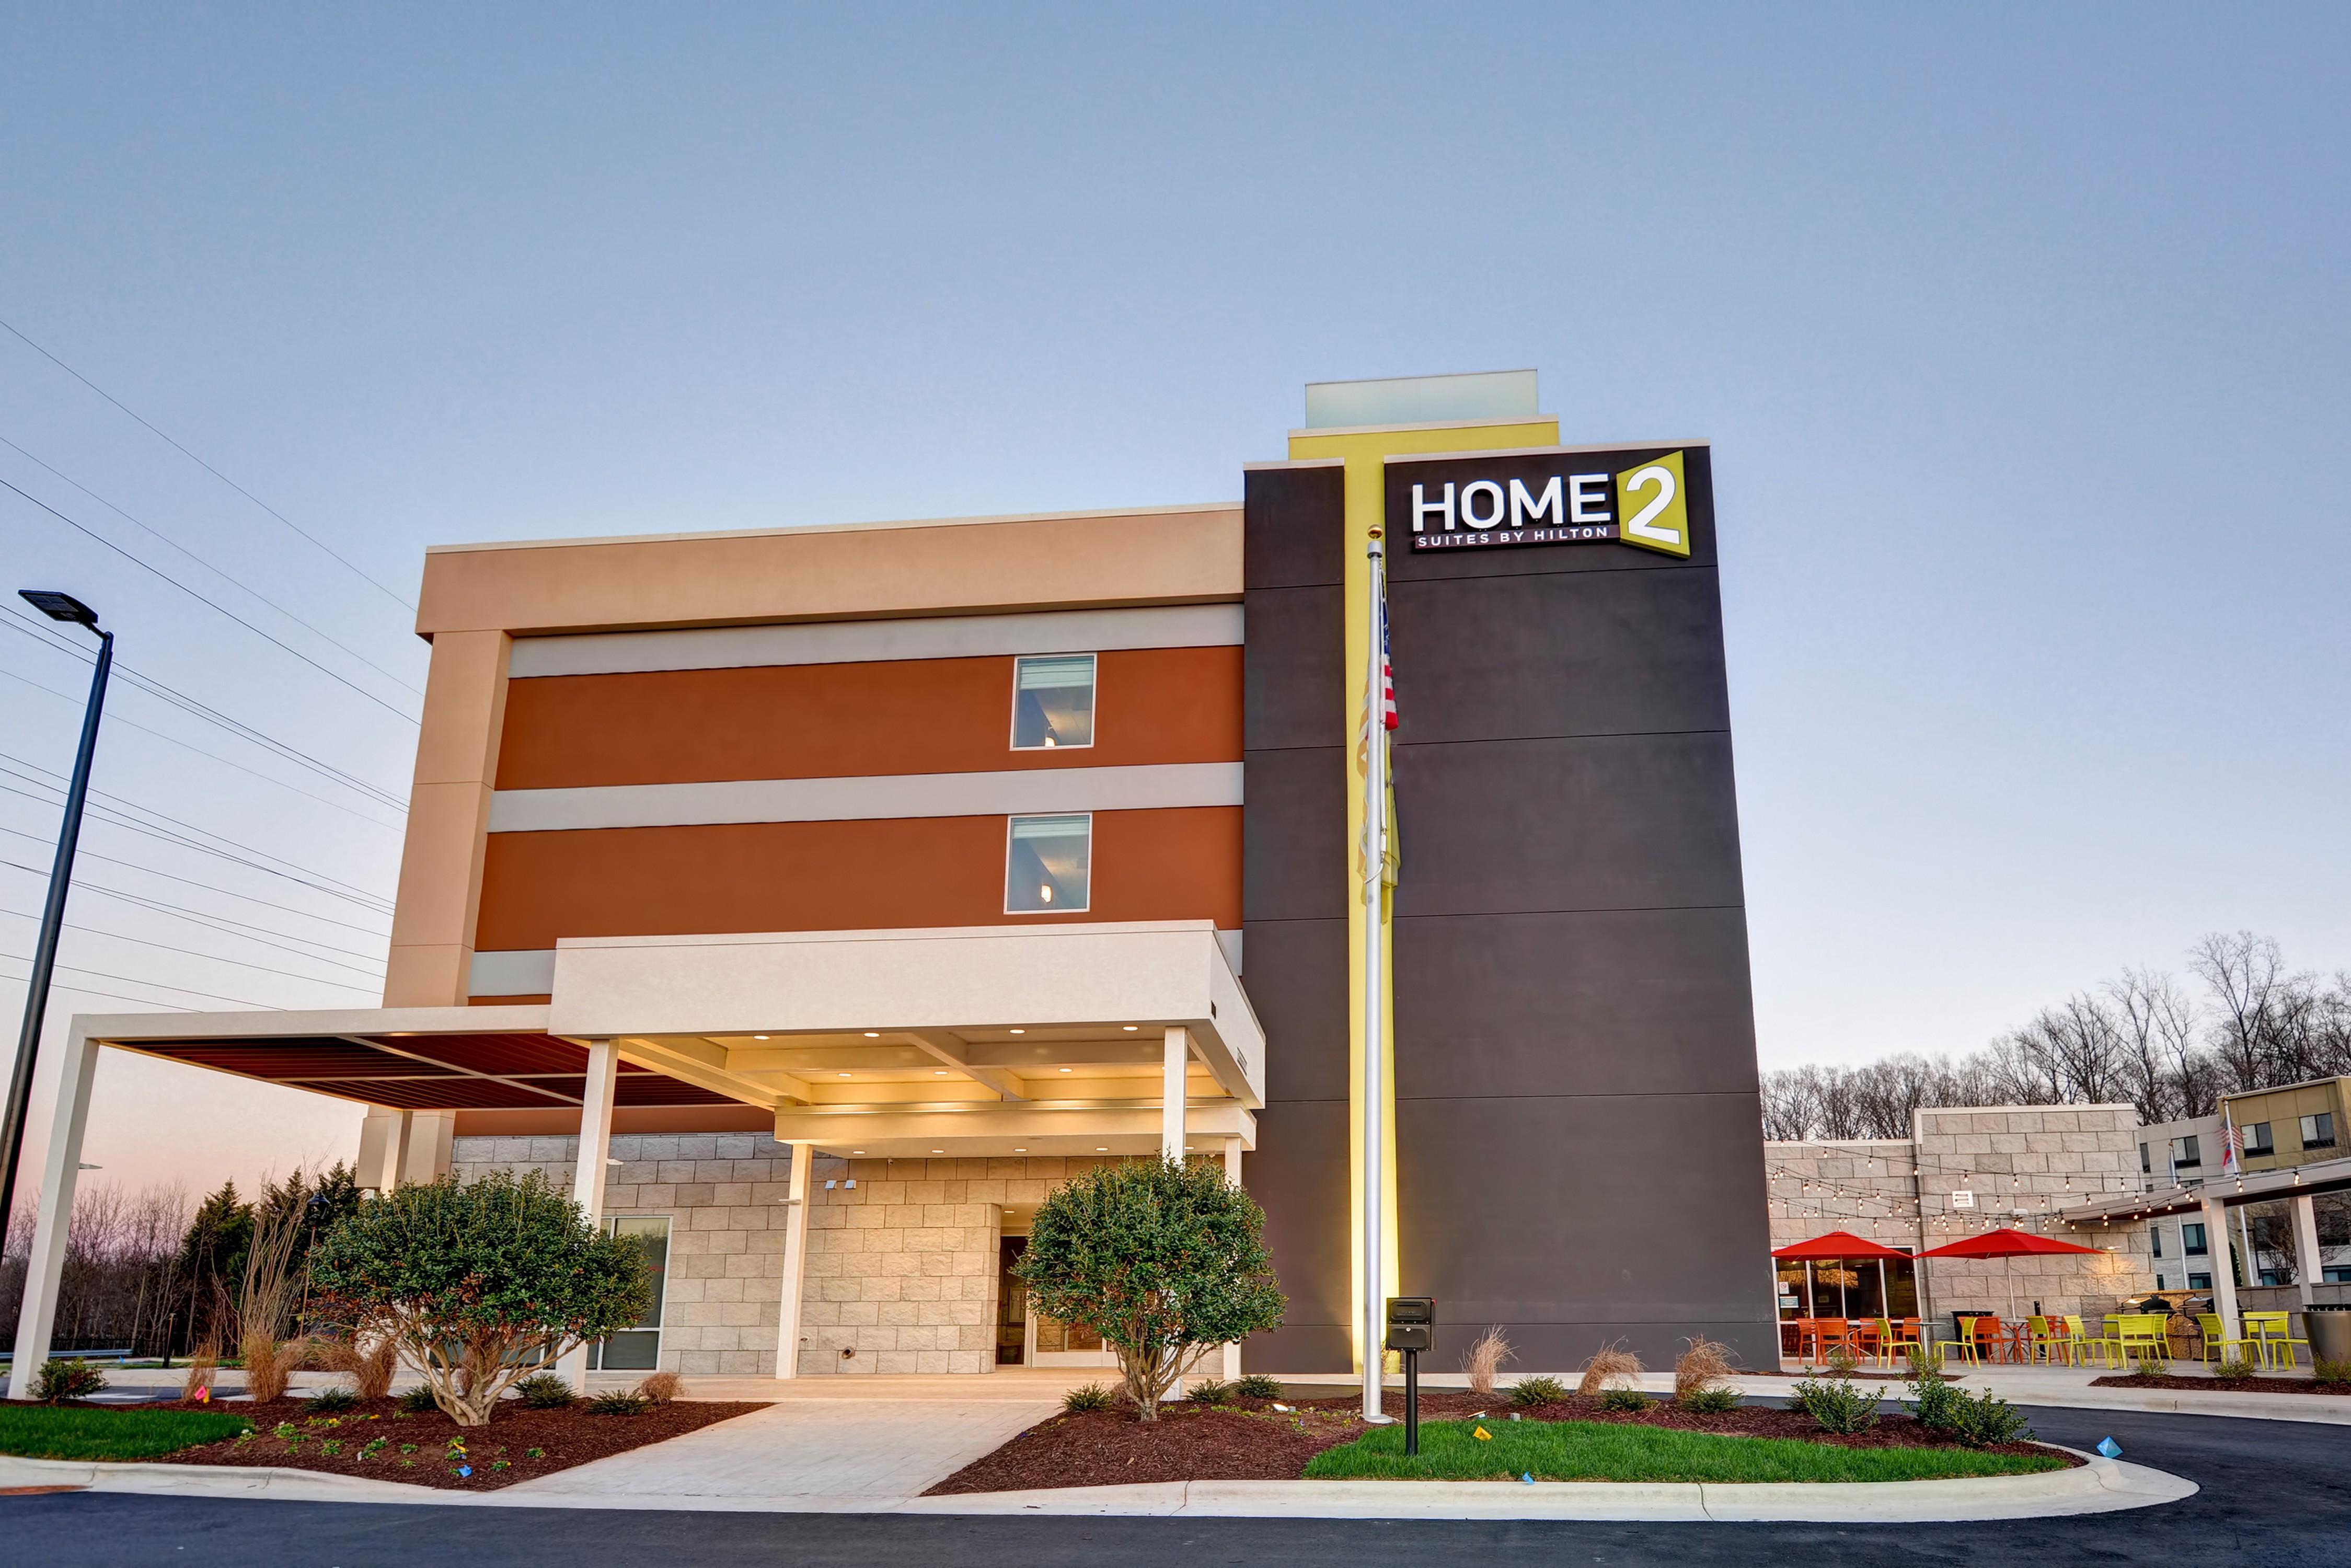 Home2 Suites By Hilton Winston Salem Hanes Mall Winston Salem North Carolina Nc